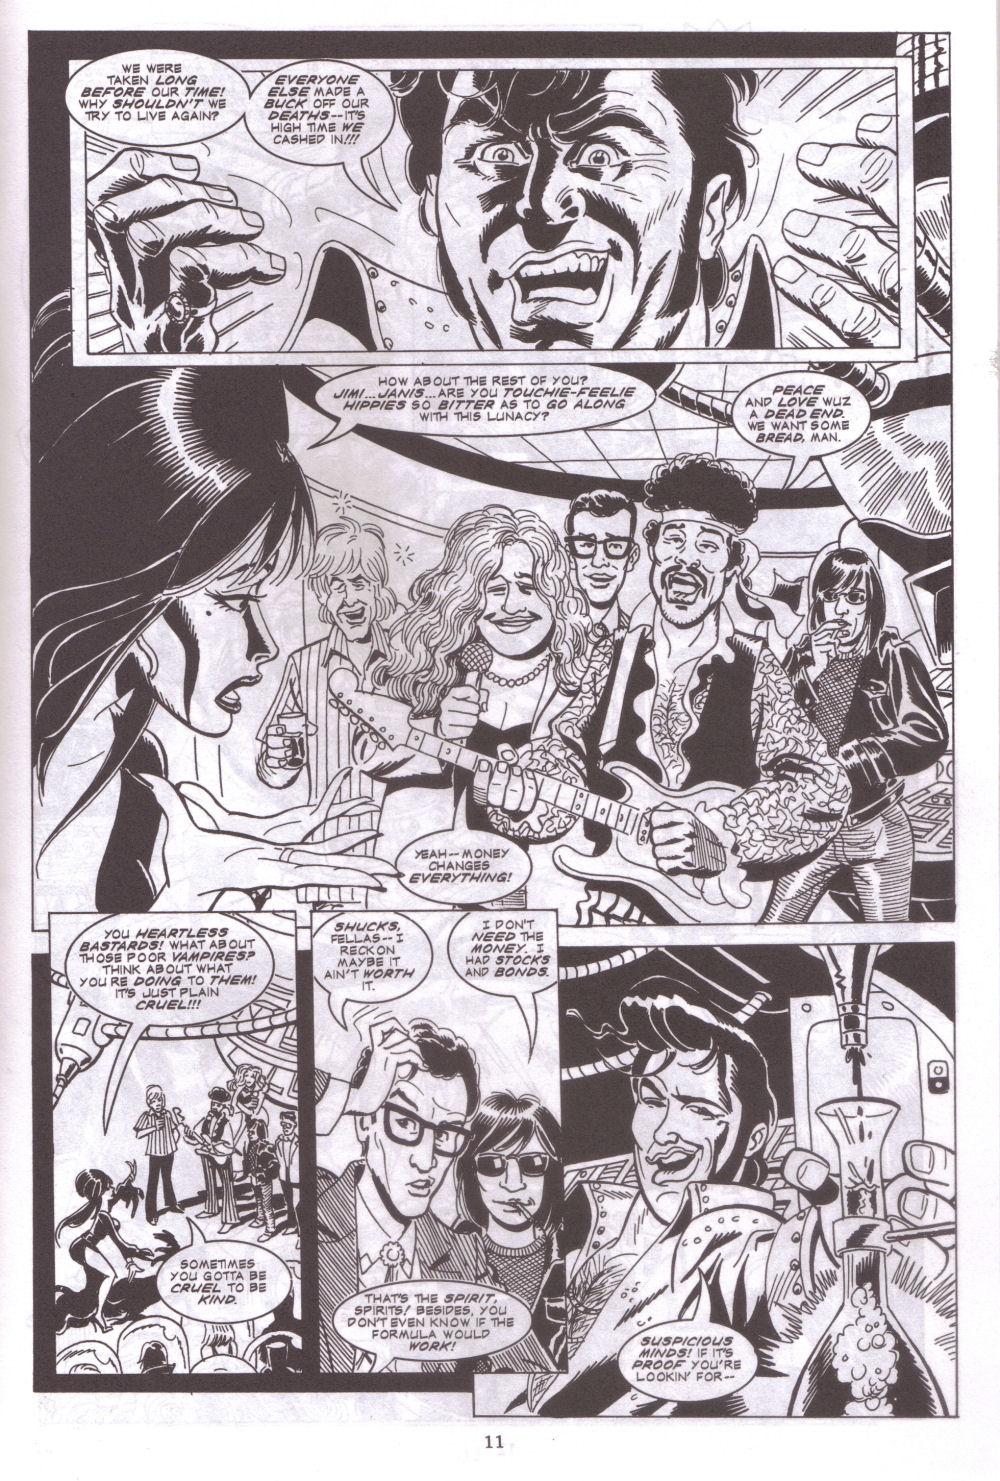 Read online Elvira, Mistress of the Dark comic -  Issue #127 - 13